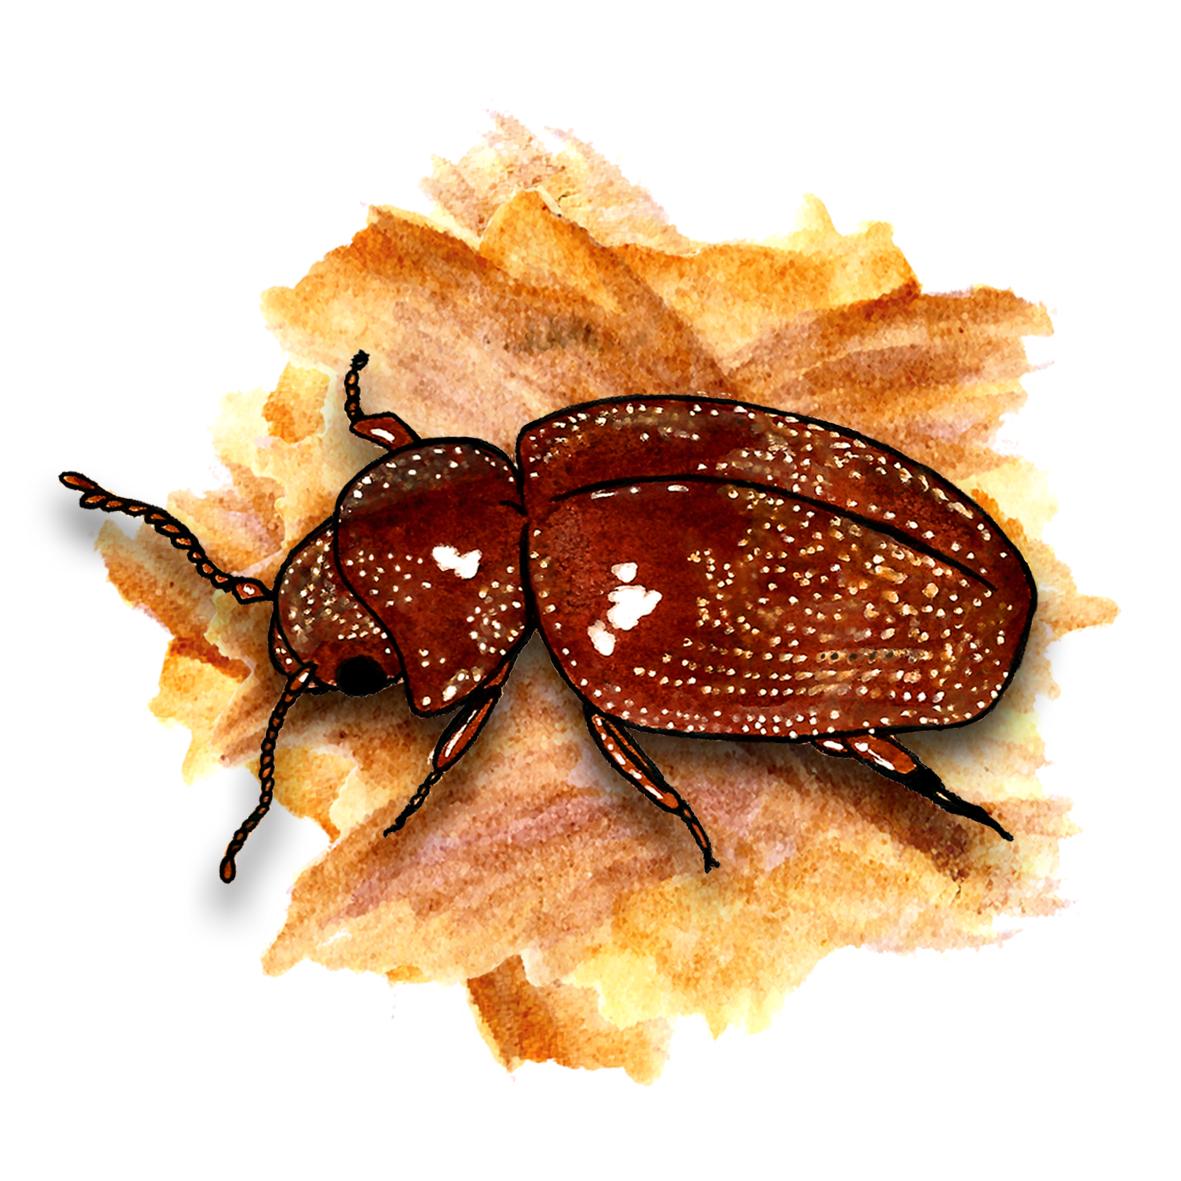 15. Cigarette Beetle